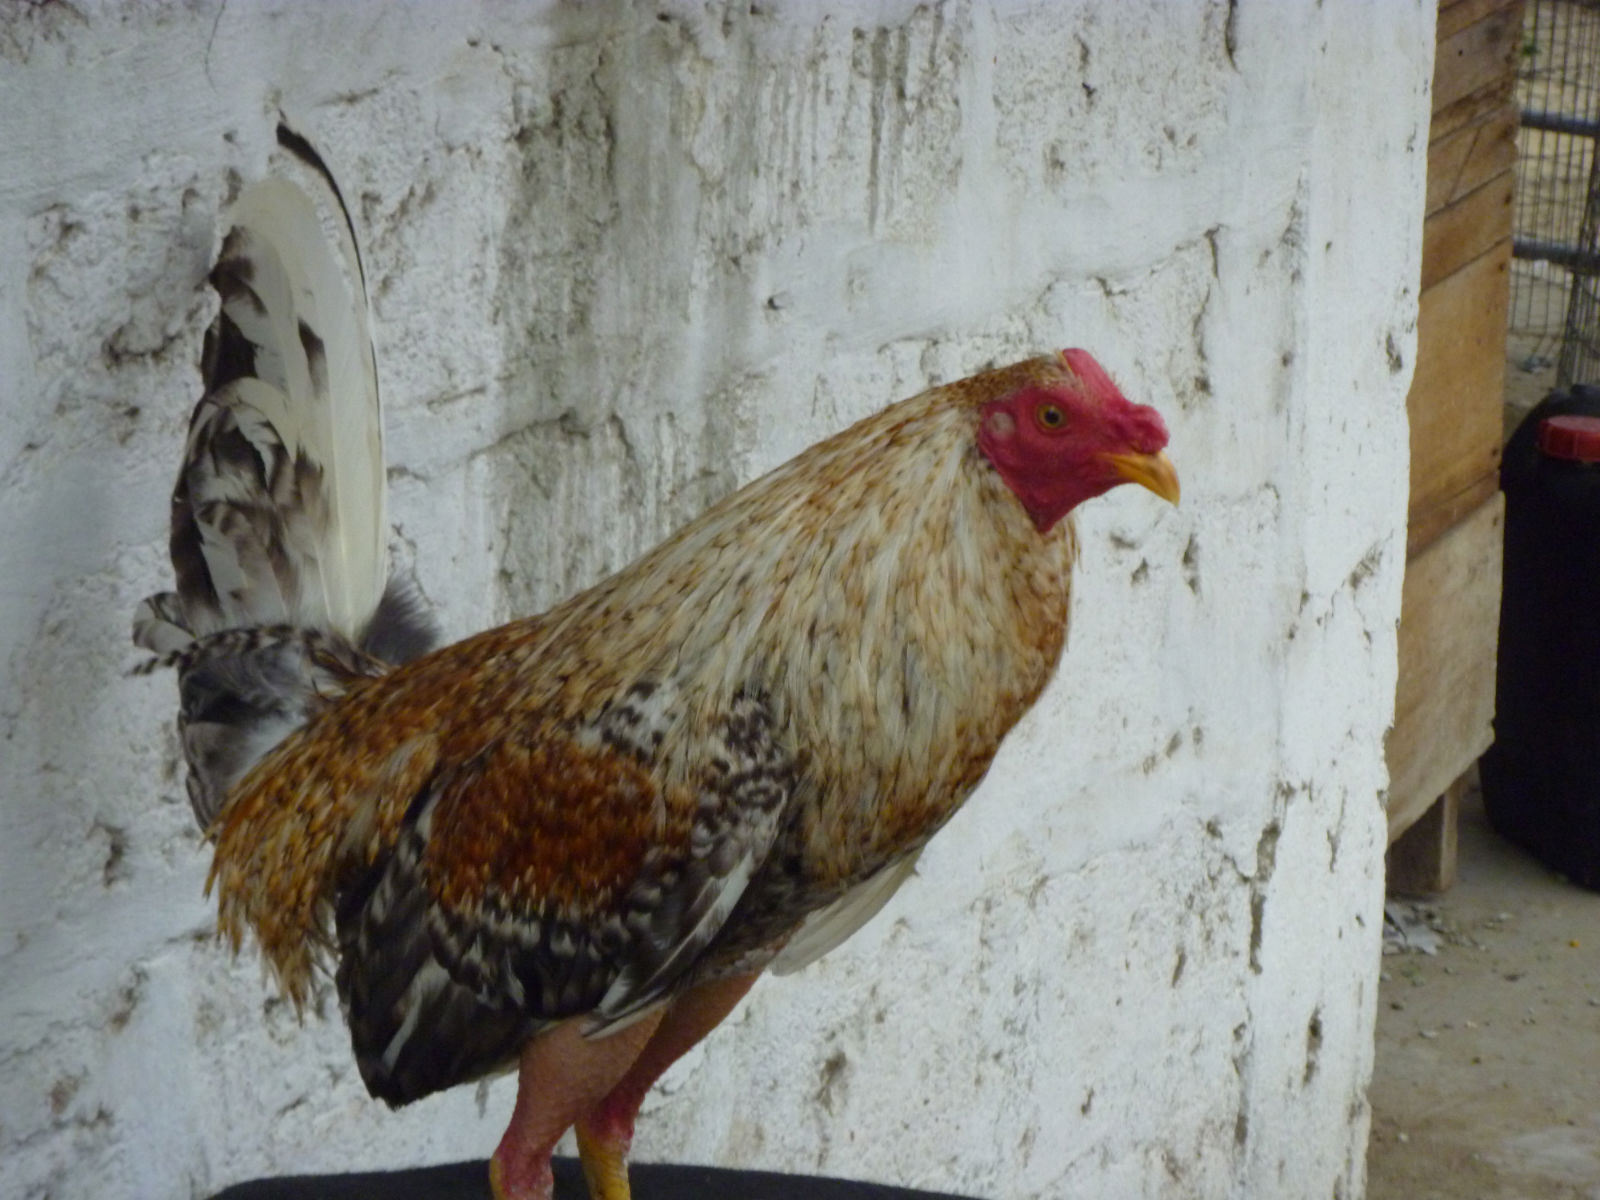 Fotos de gallos de gene batia 19